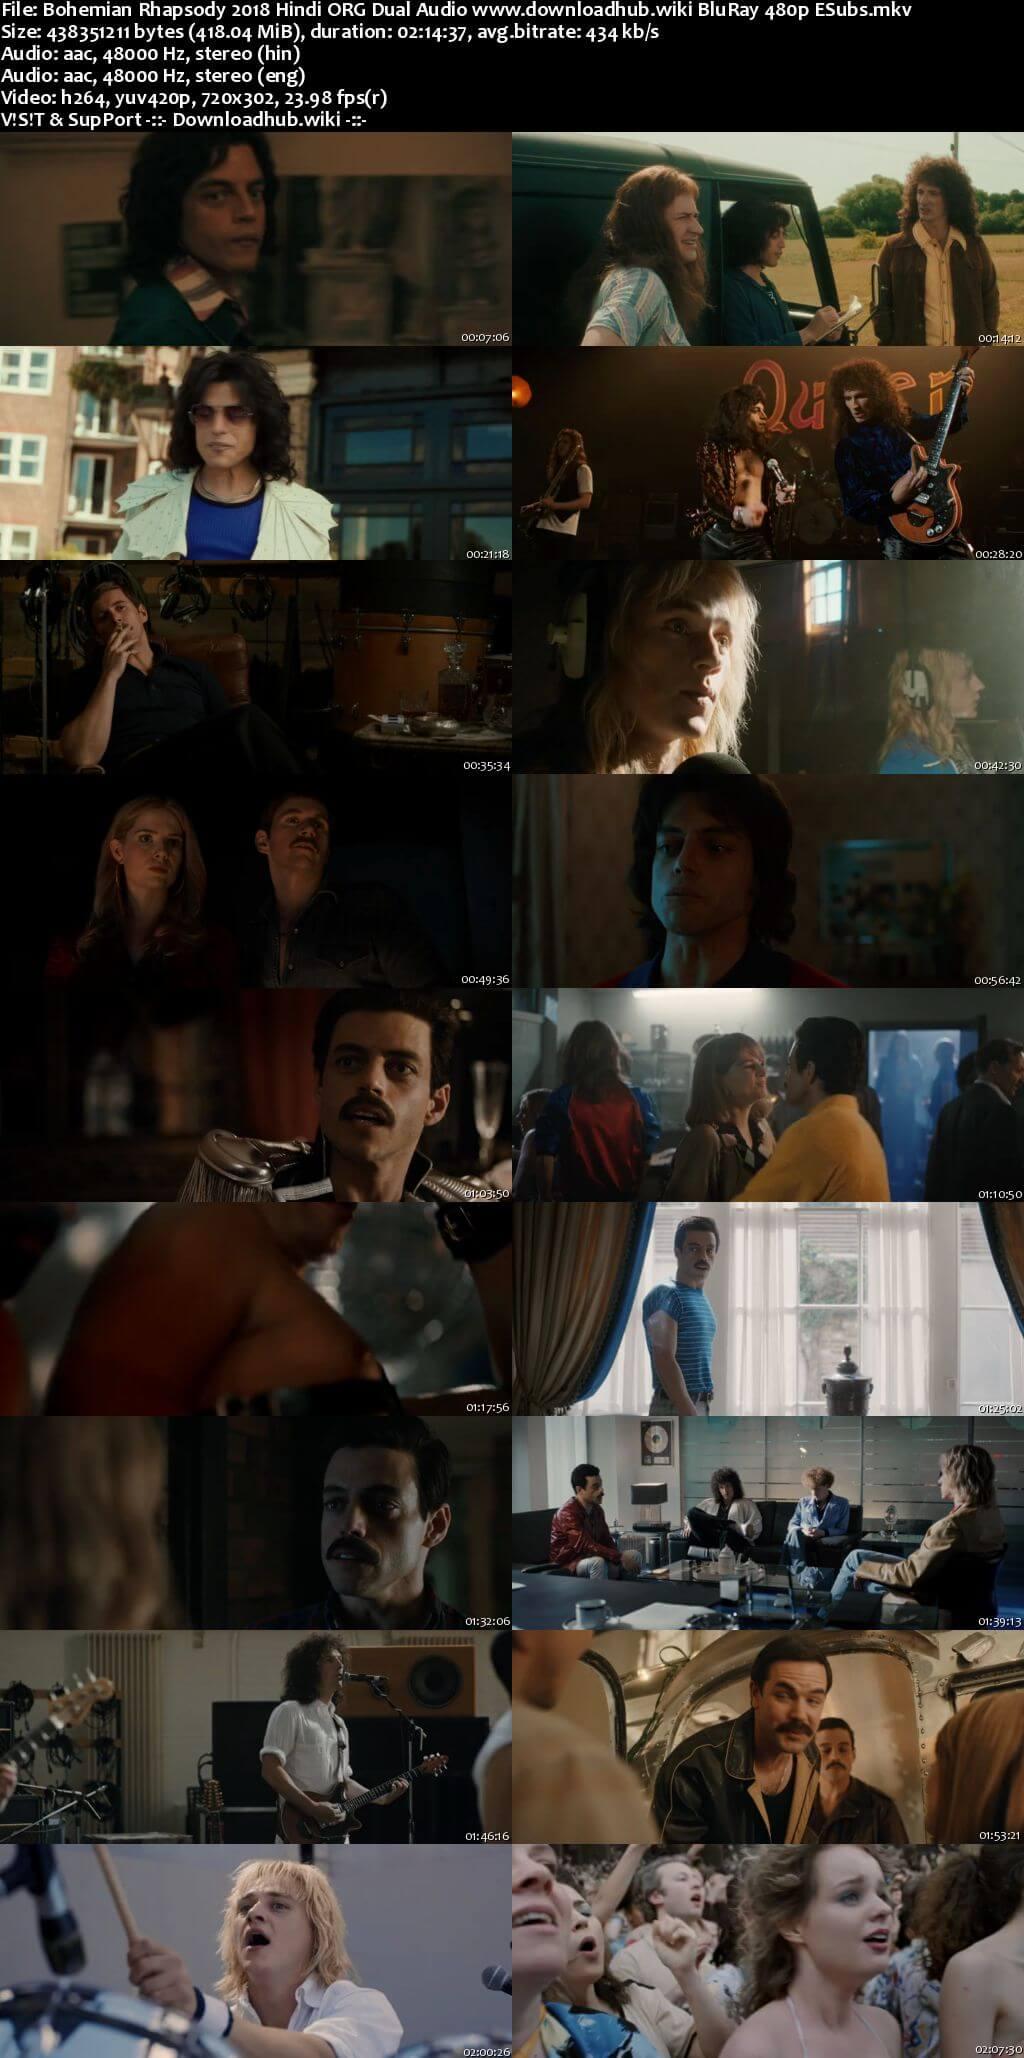 Bohemian Rhapsody 2018 Hindi ORG Dual Audio 400MB BluRay 480p ESubs